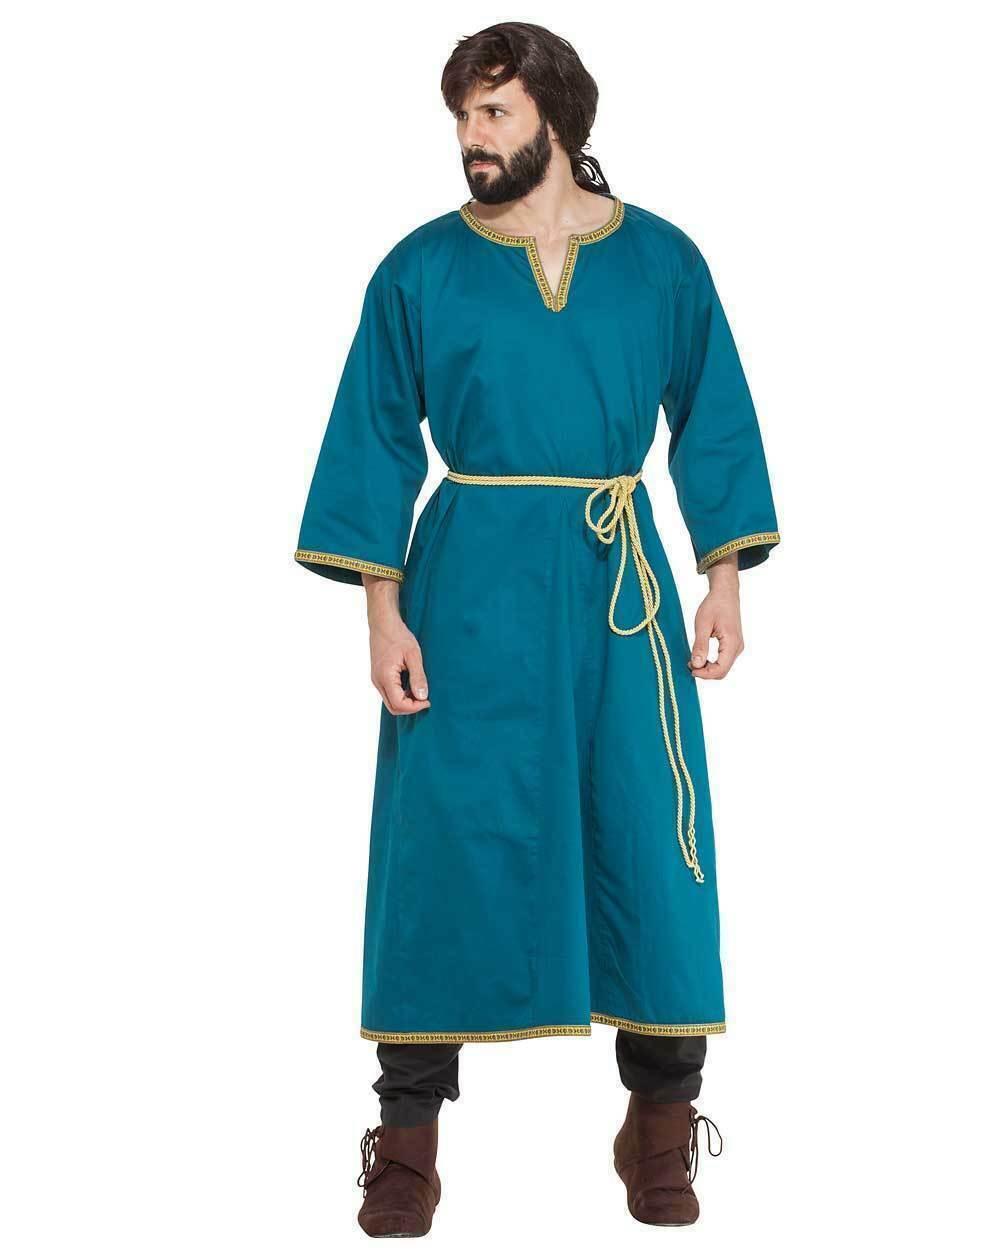 X-Mas Cosplay CostumeMEDIEVAL ROMAN,GREEK Tunic Surcoat Renaissance SCA LARP